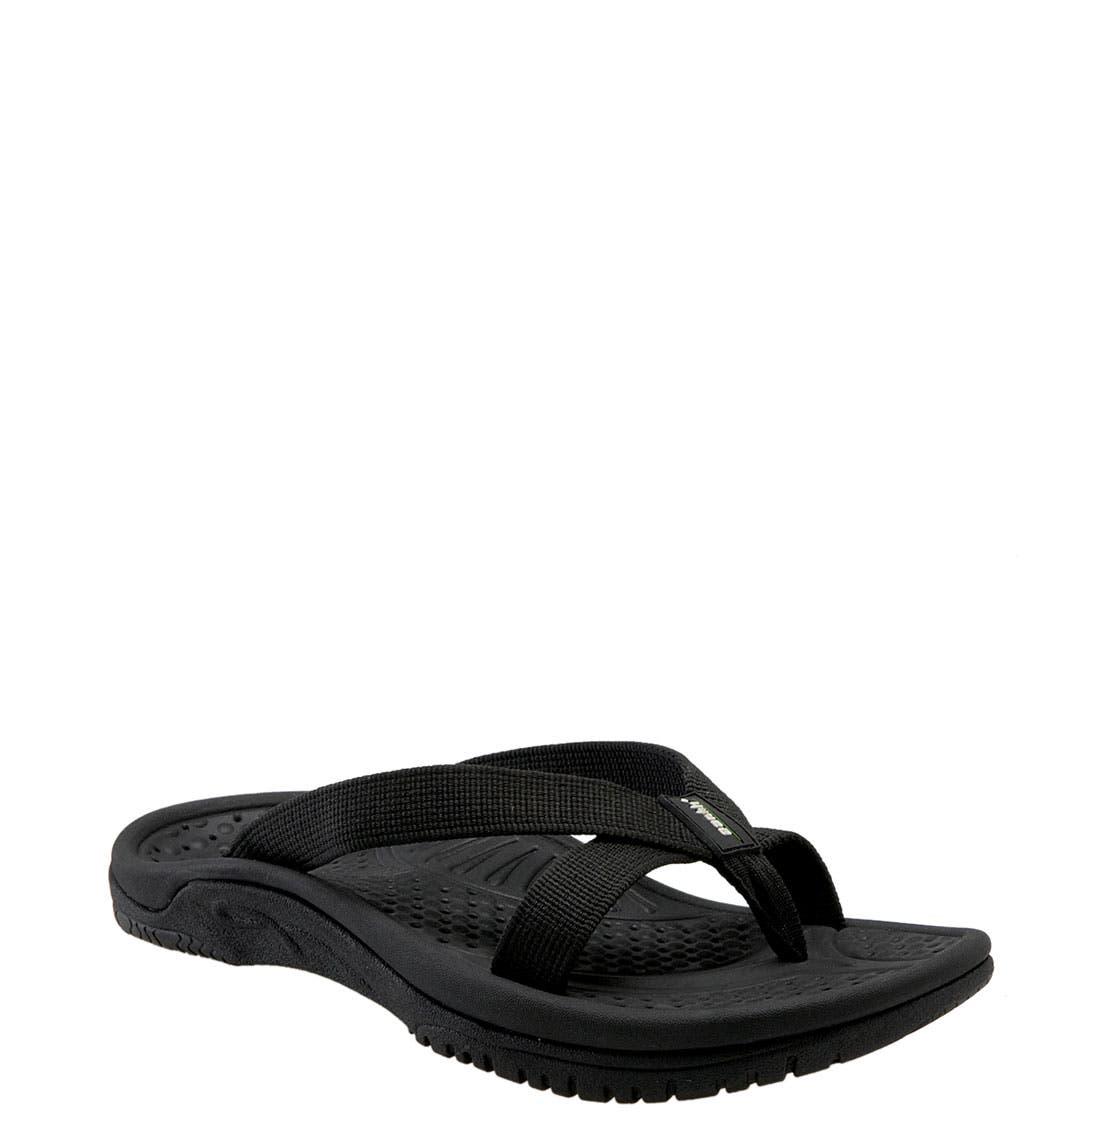 'Cabo San Lucas' Sandal,                             Main thumbnail 1, color,                             001